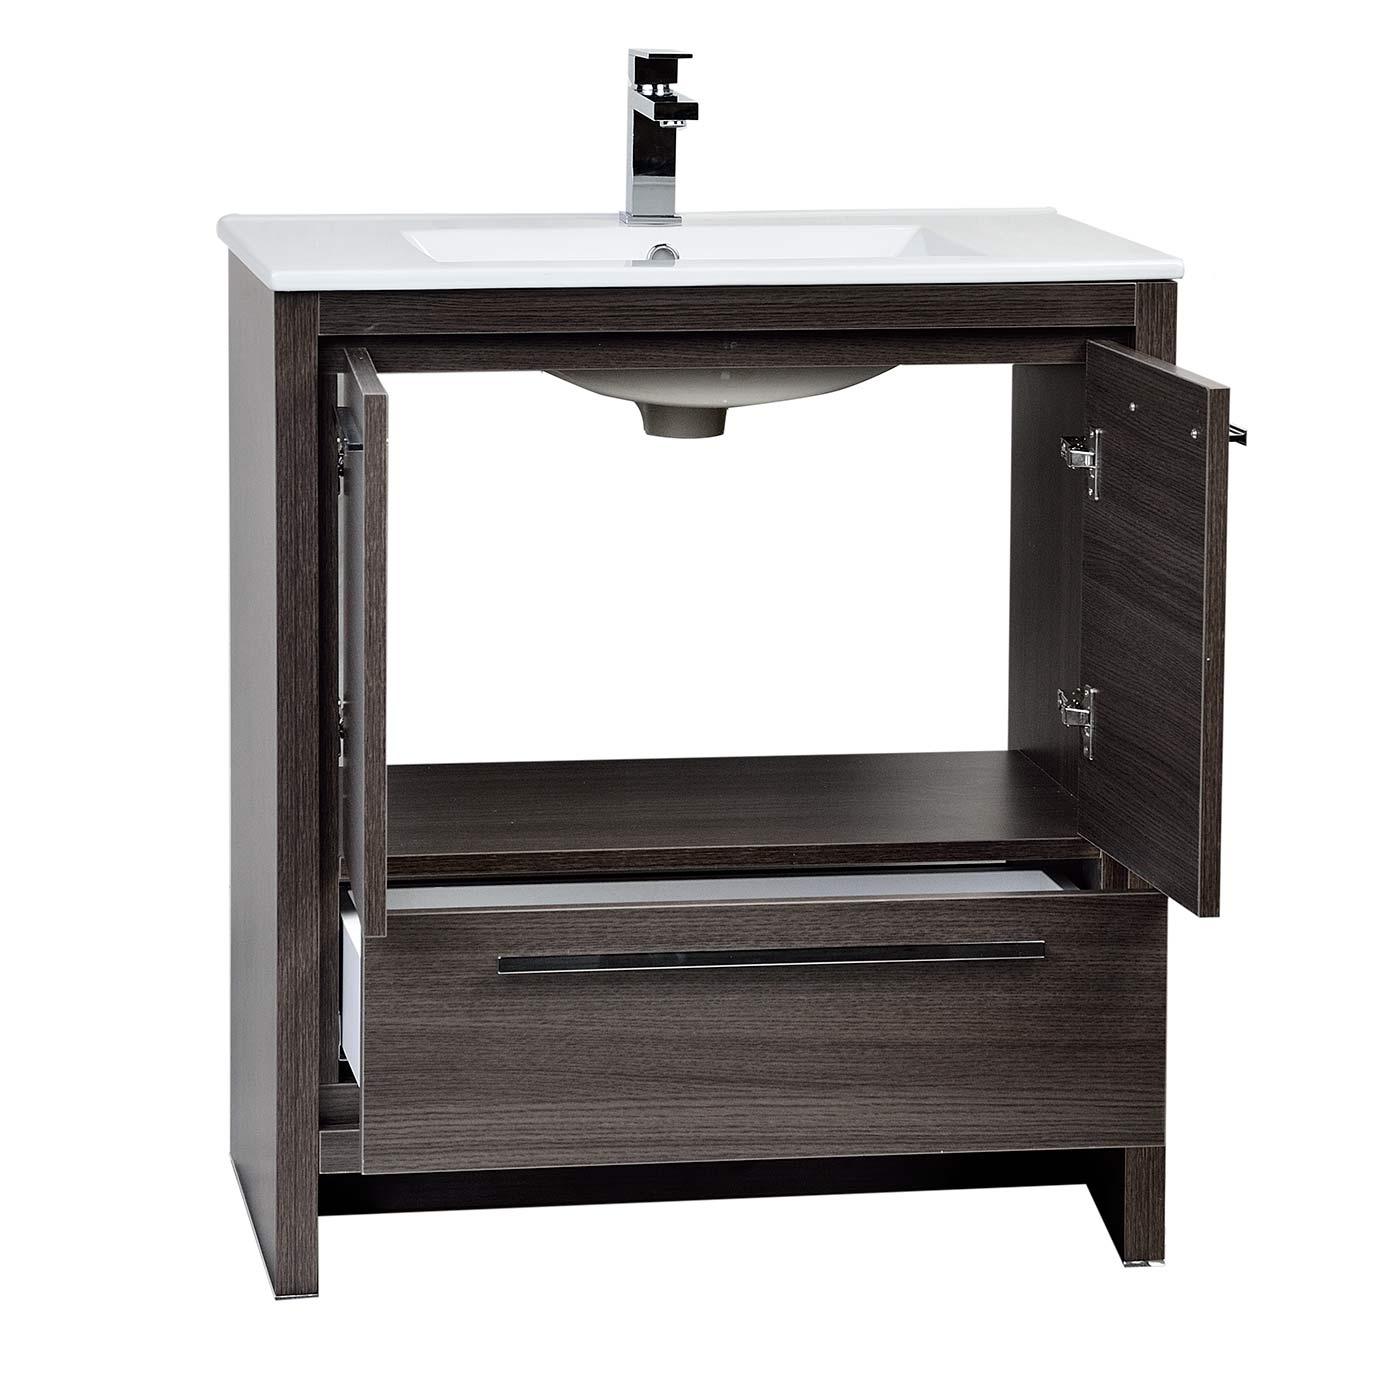 Buy Cbi Enna 29 5 Inch Grey Oak Modern Bathroom Vanity Tn La750 Go On